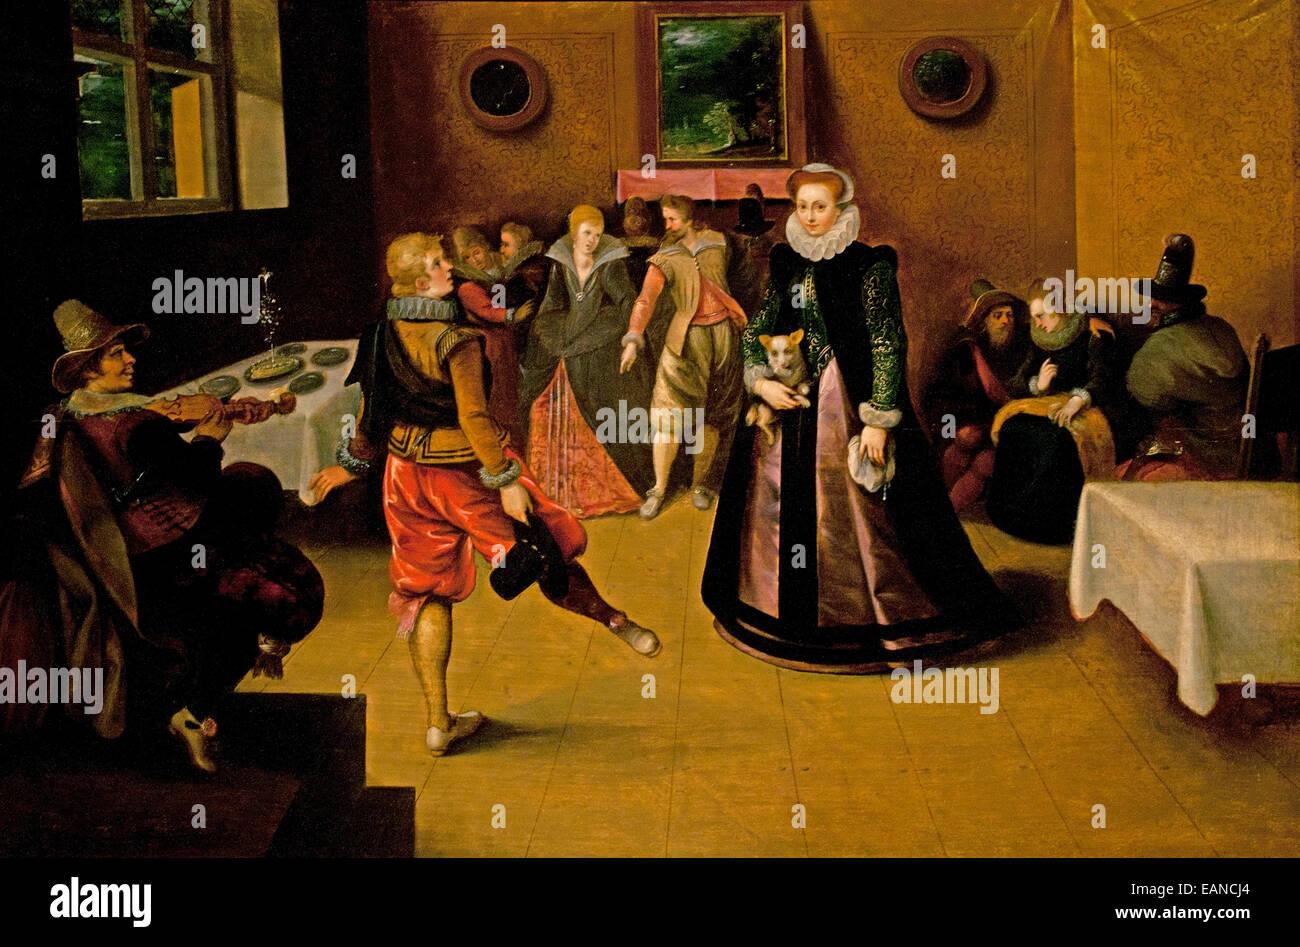 Scène de Danse - Danse Scène Hieronymus Francken 1578 - 1623 Belgique baroque flamand Photo Stock